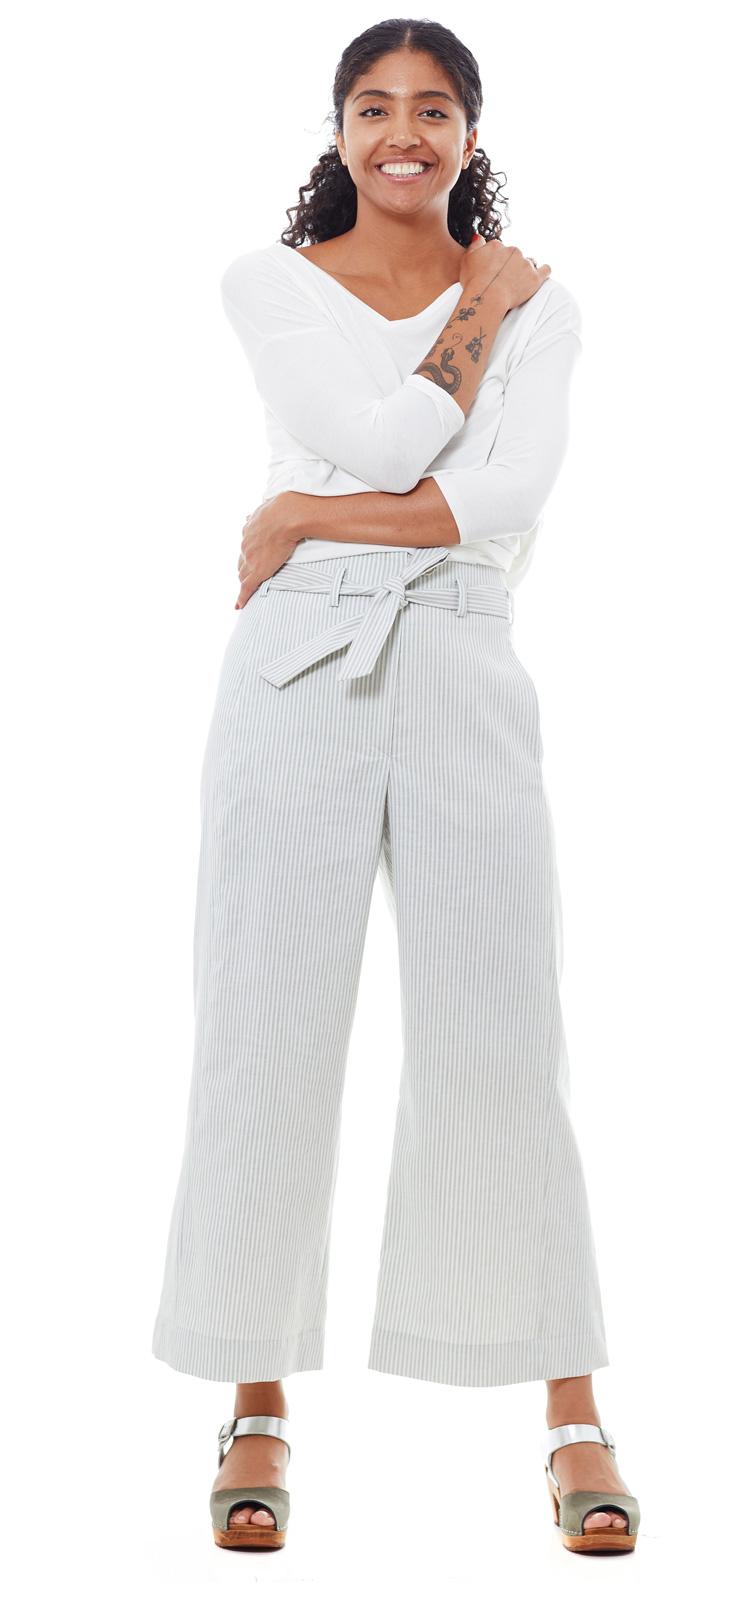 Culotte Streifen grau weiss